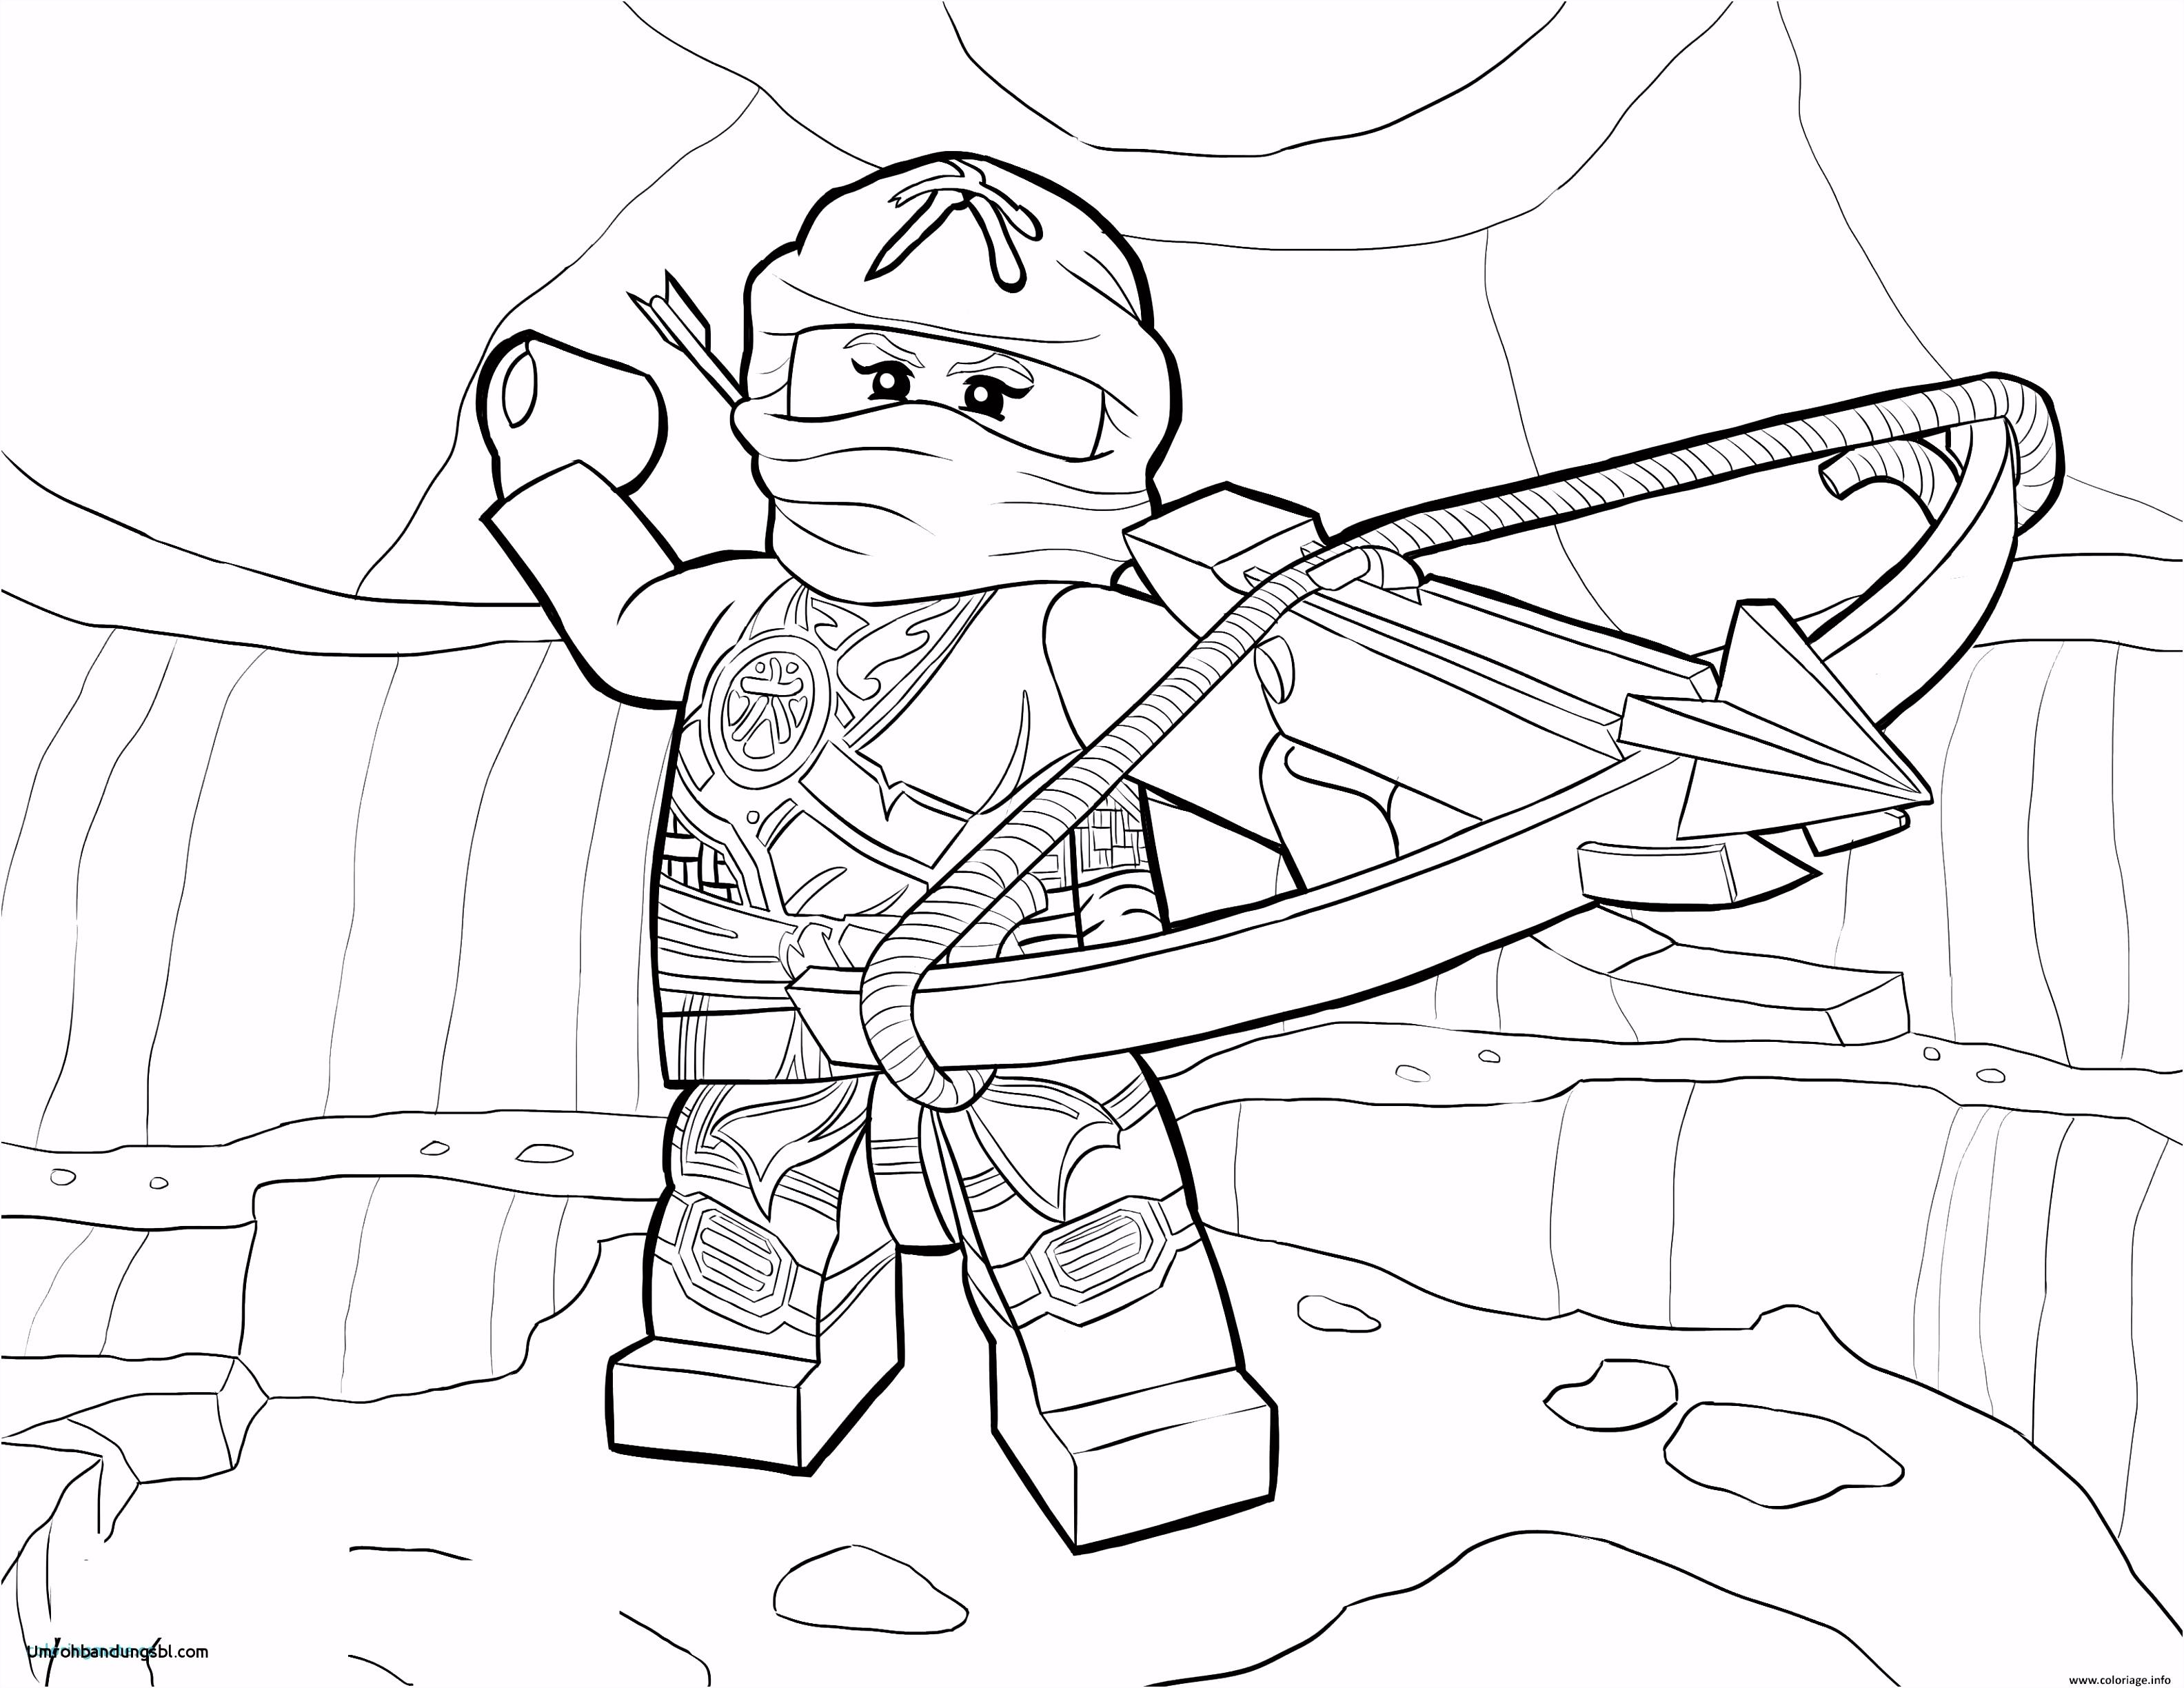 Inspirational Lego Hobbit Coloring Pages umrohbandungsbl